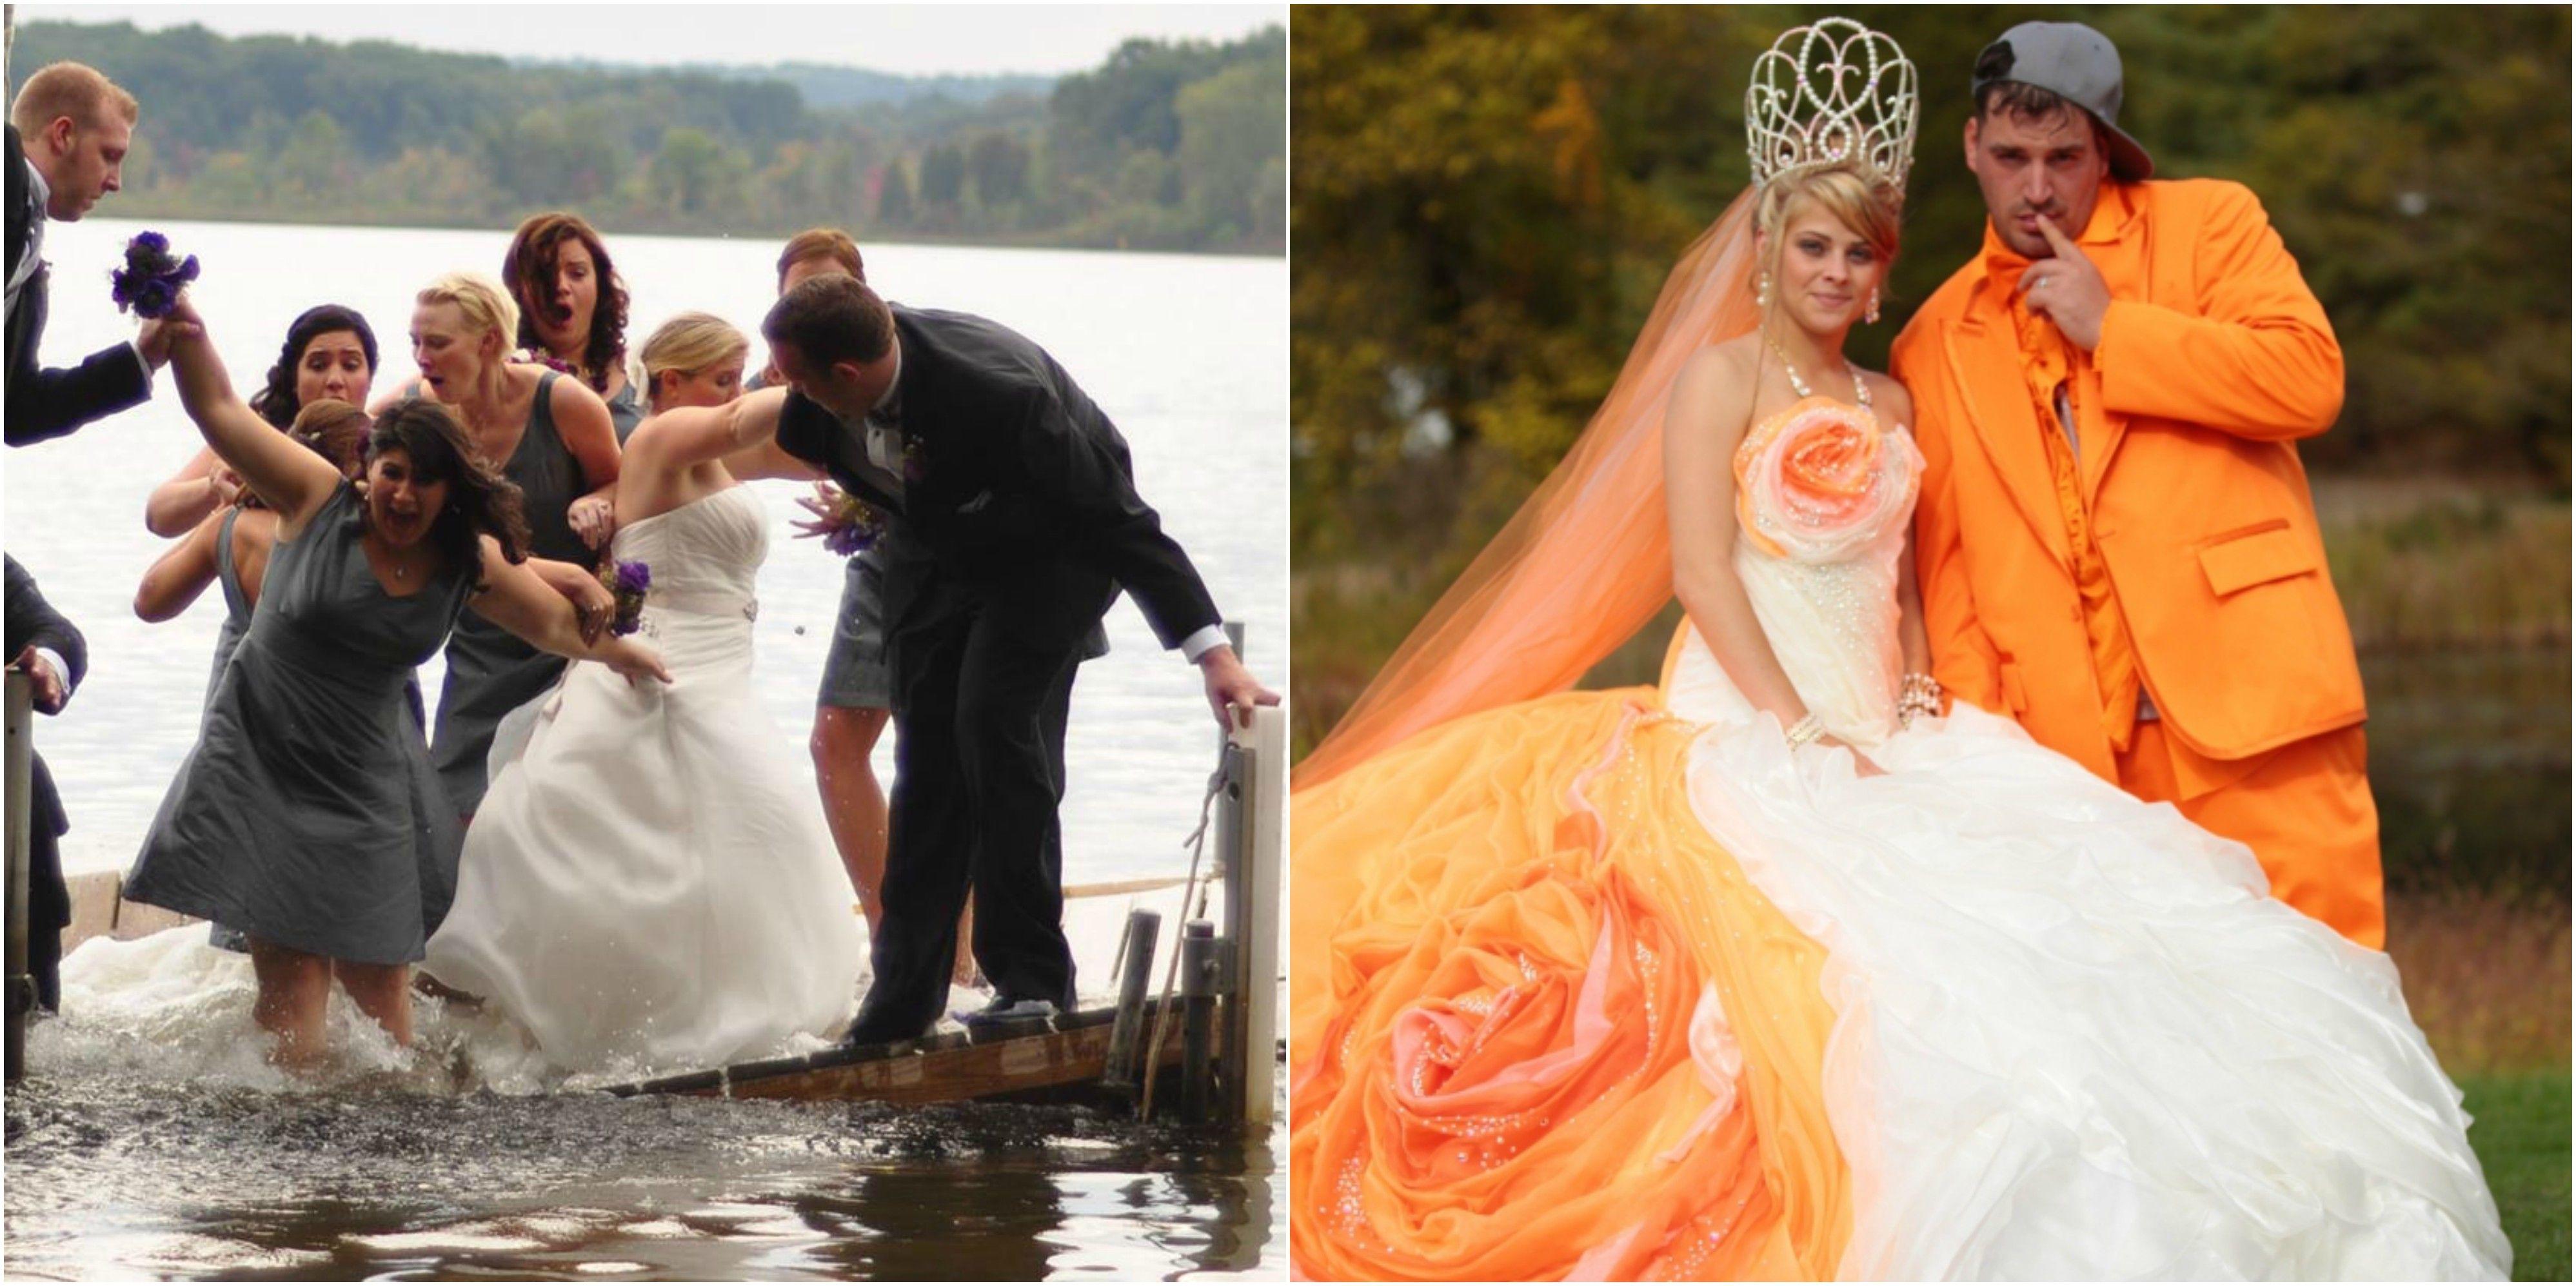 wedding-photography-disasters-photo-retouching-sample